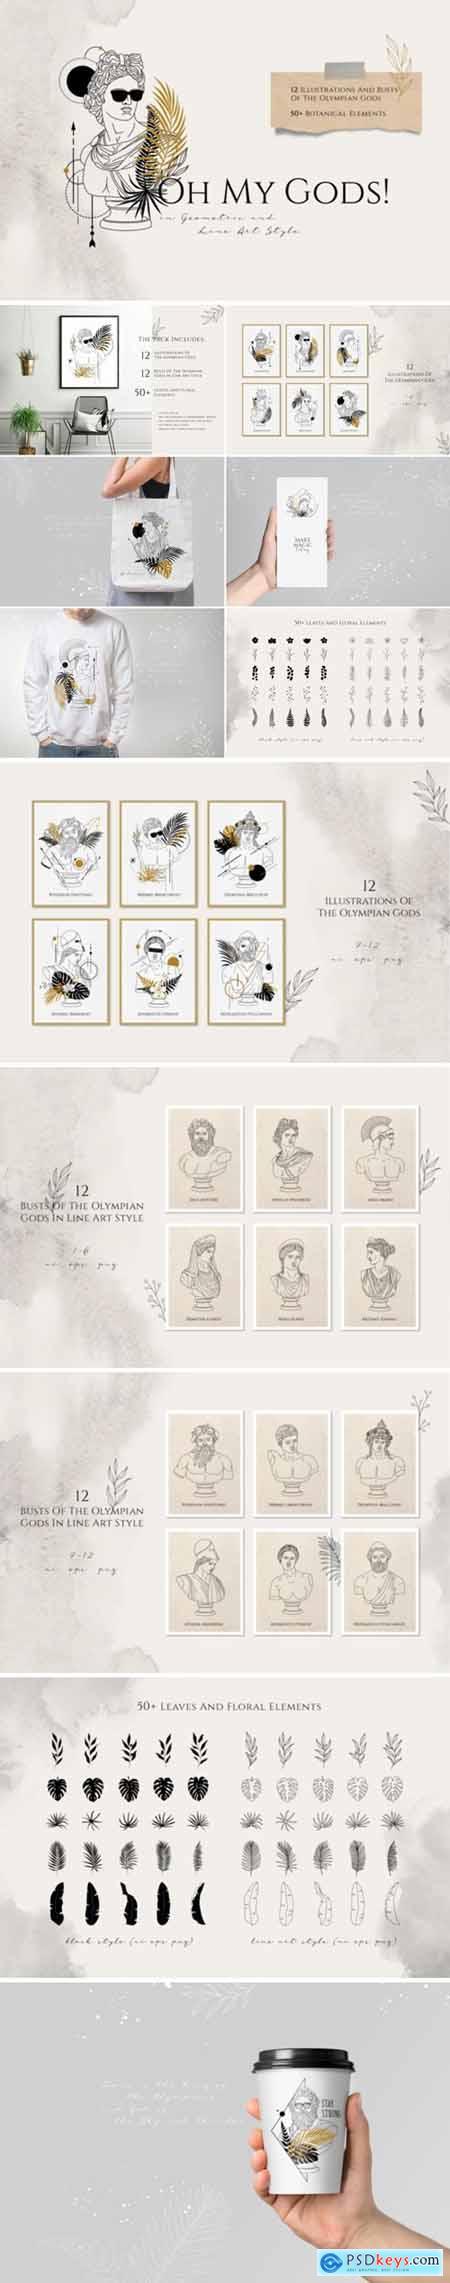 Oh My Gods! Olympian Gods in Line Art 3633440